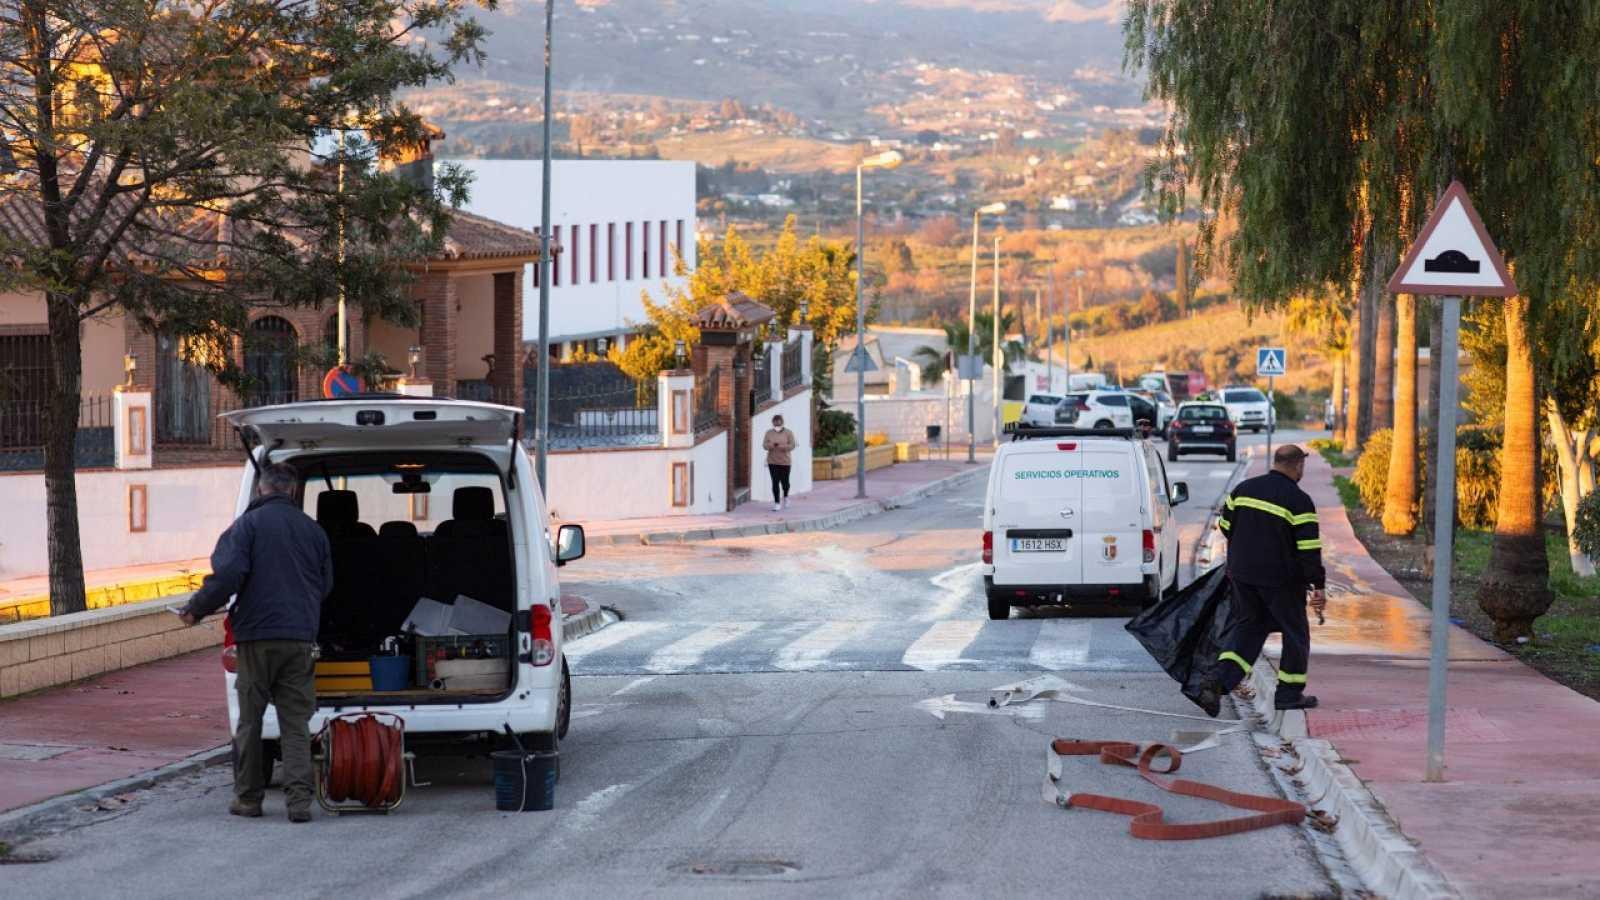 Primer caso de violencia de género de 2021 en España: dos mujeres heridas graves en Málaga